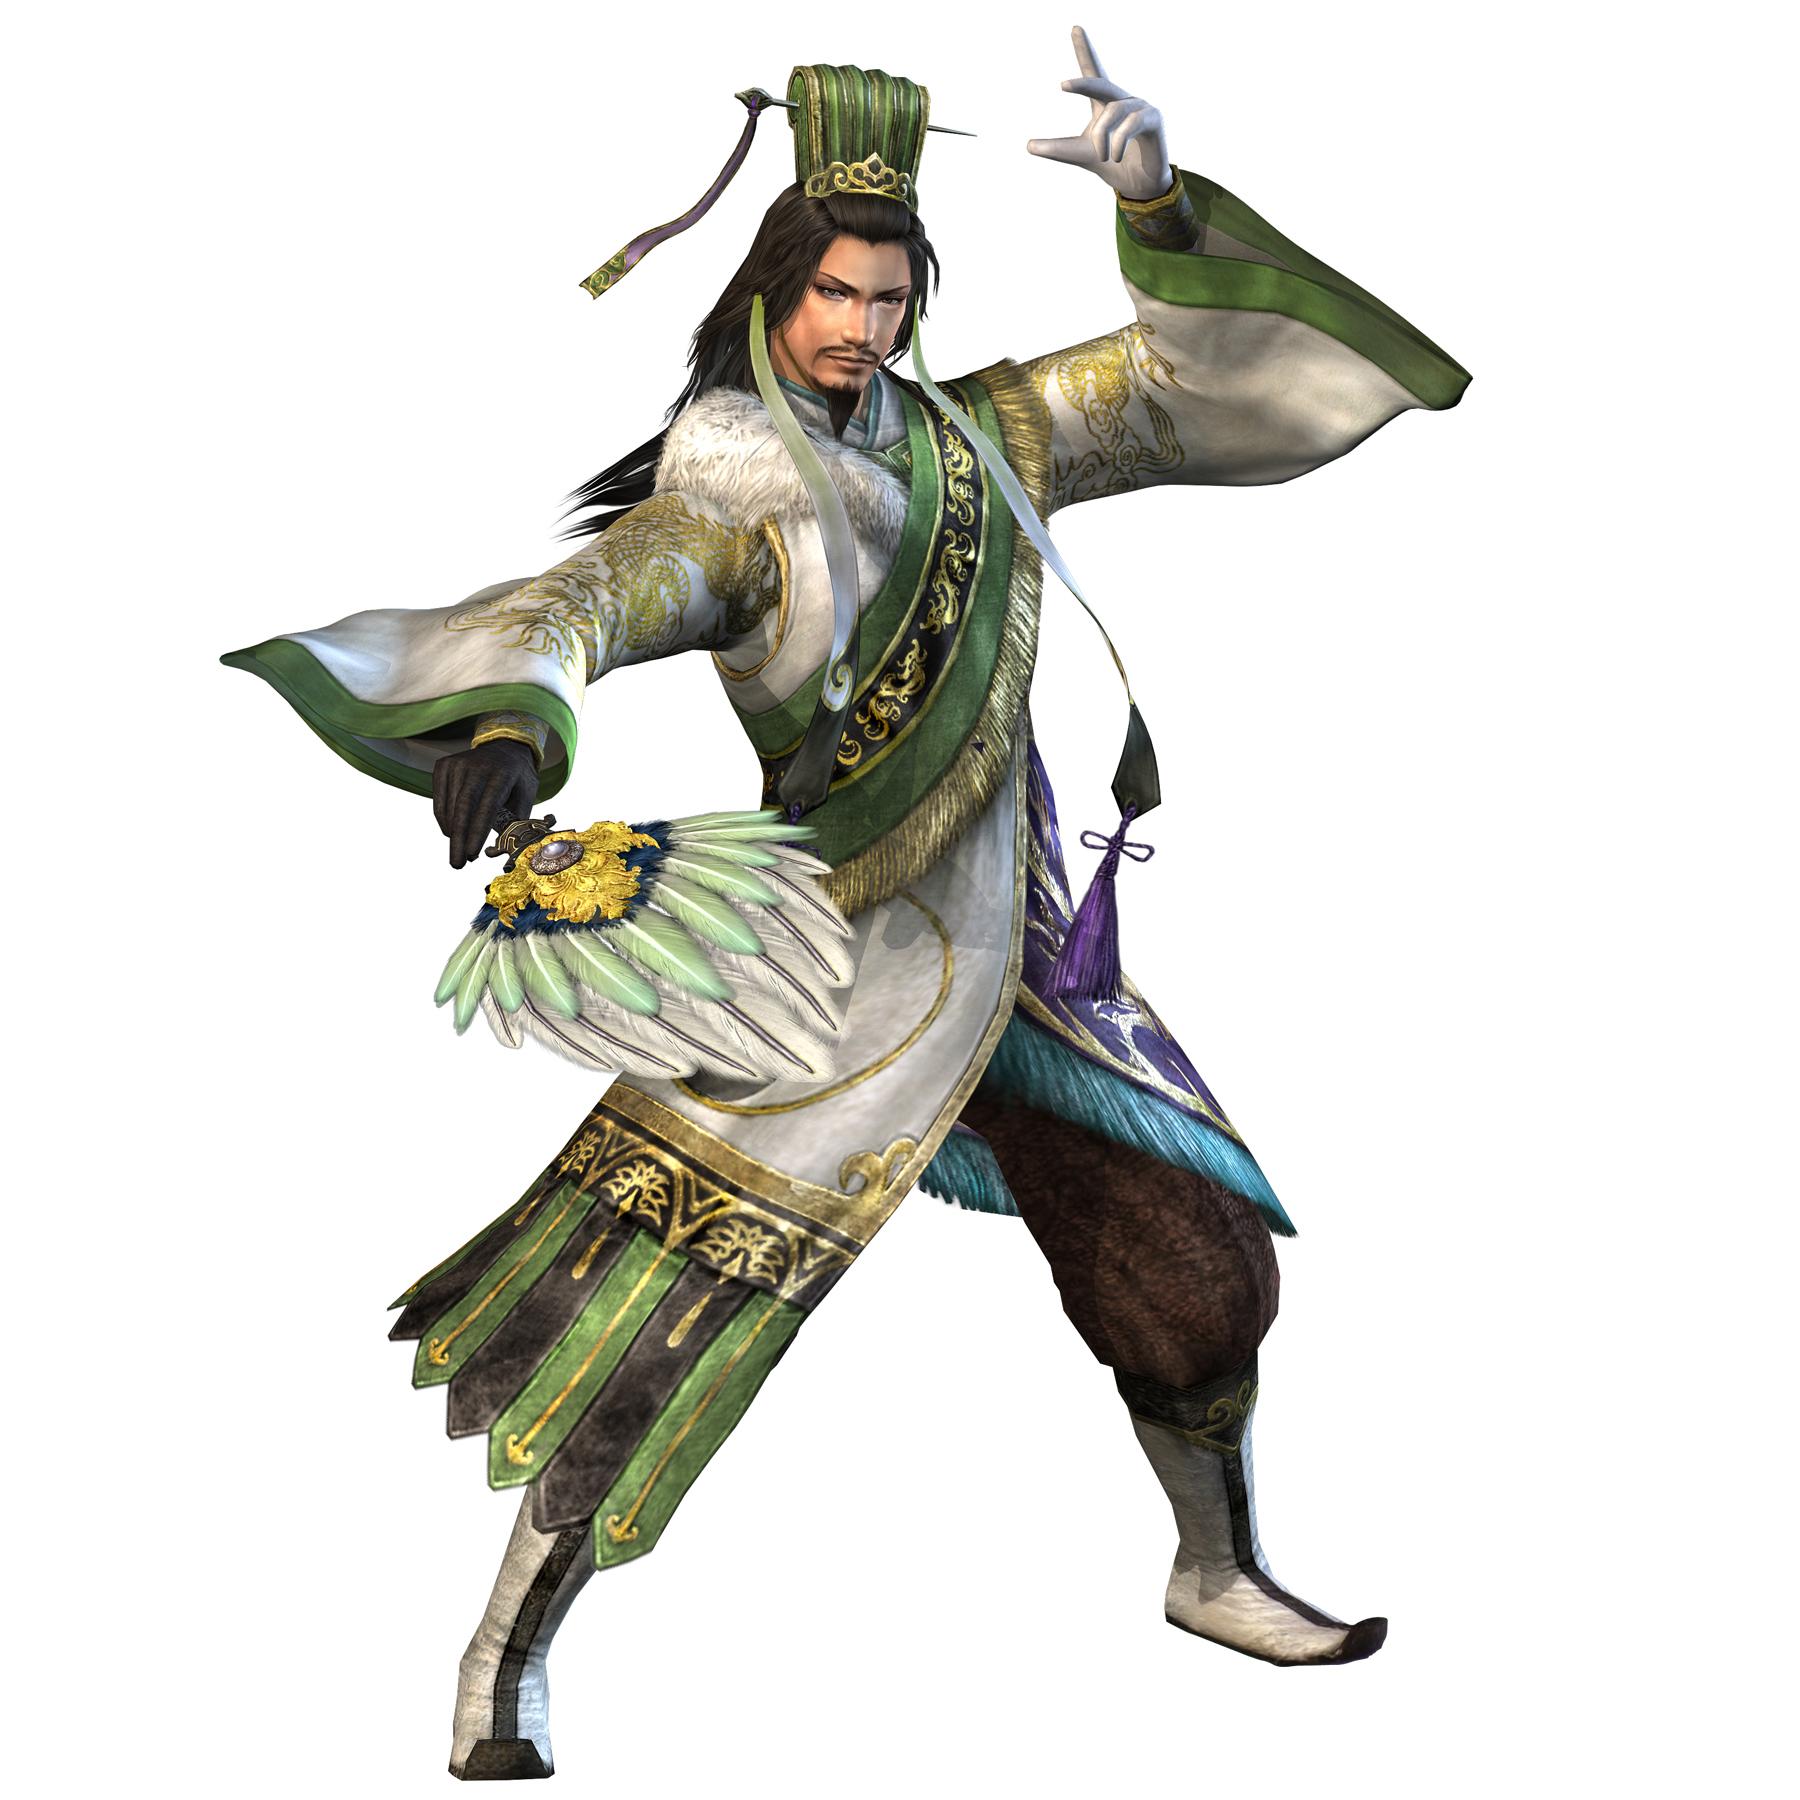 Warriors Orochi 3 9 Tails: Image - Zhugeliang-800.jpg